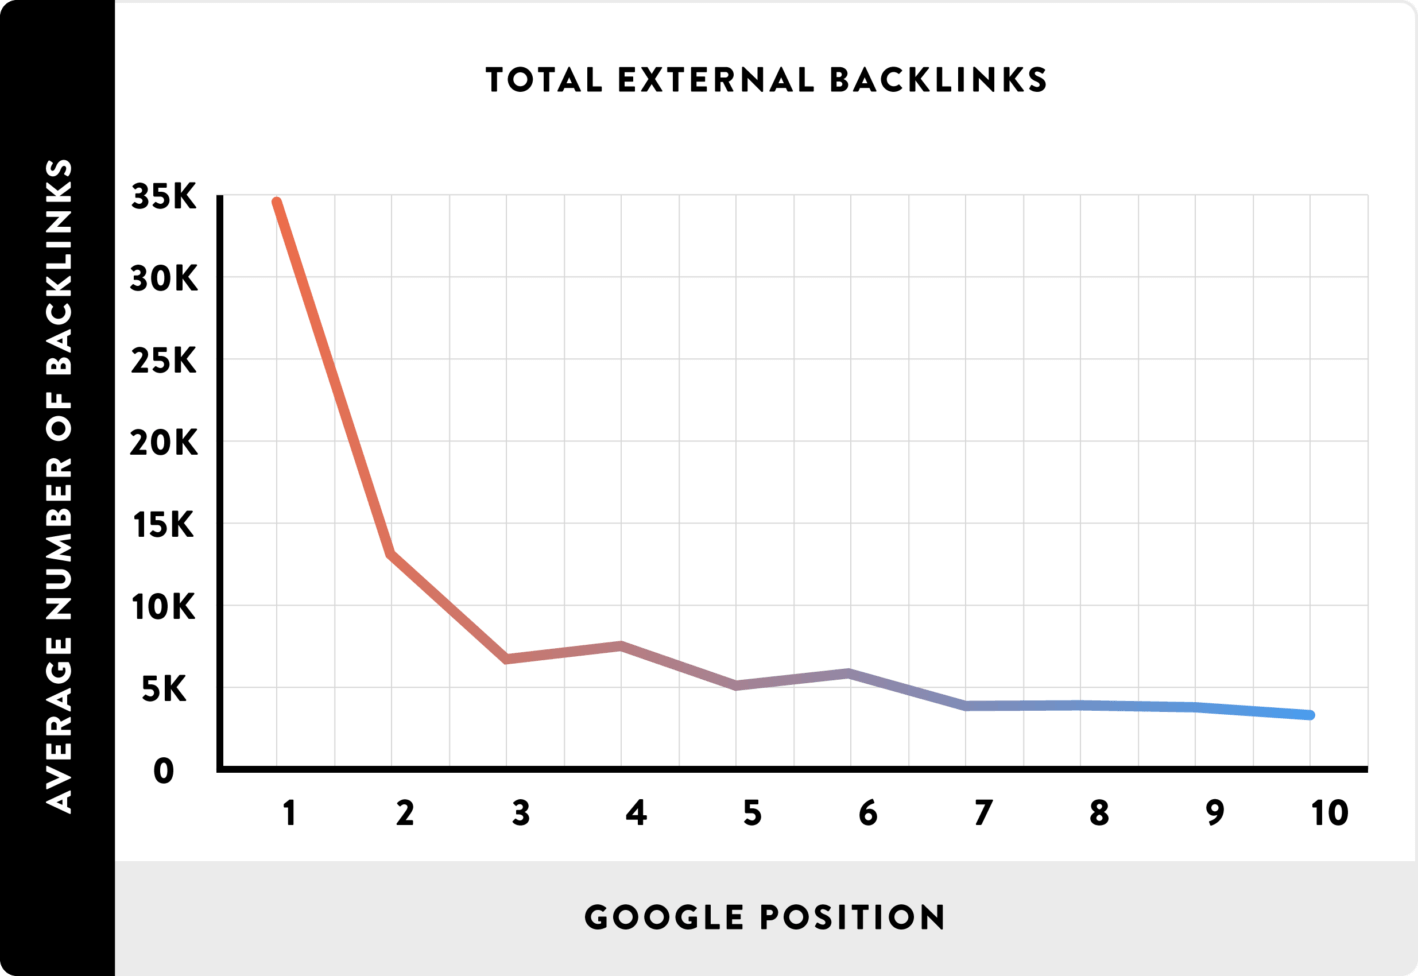 13_Total-External-Backlinks_line2-1418x976